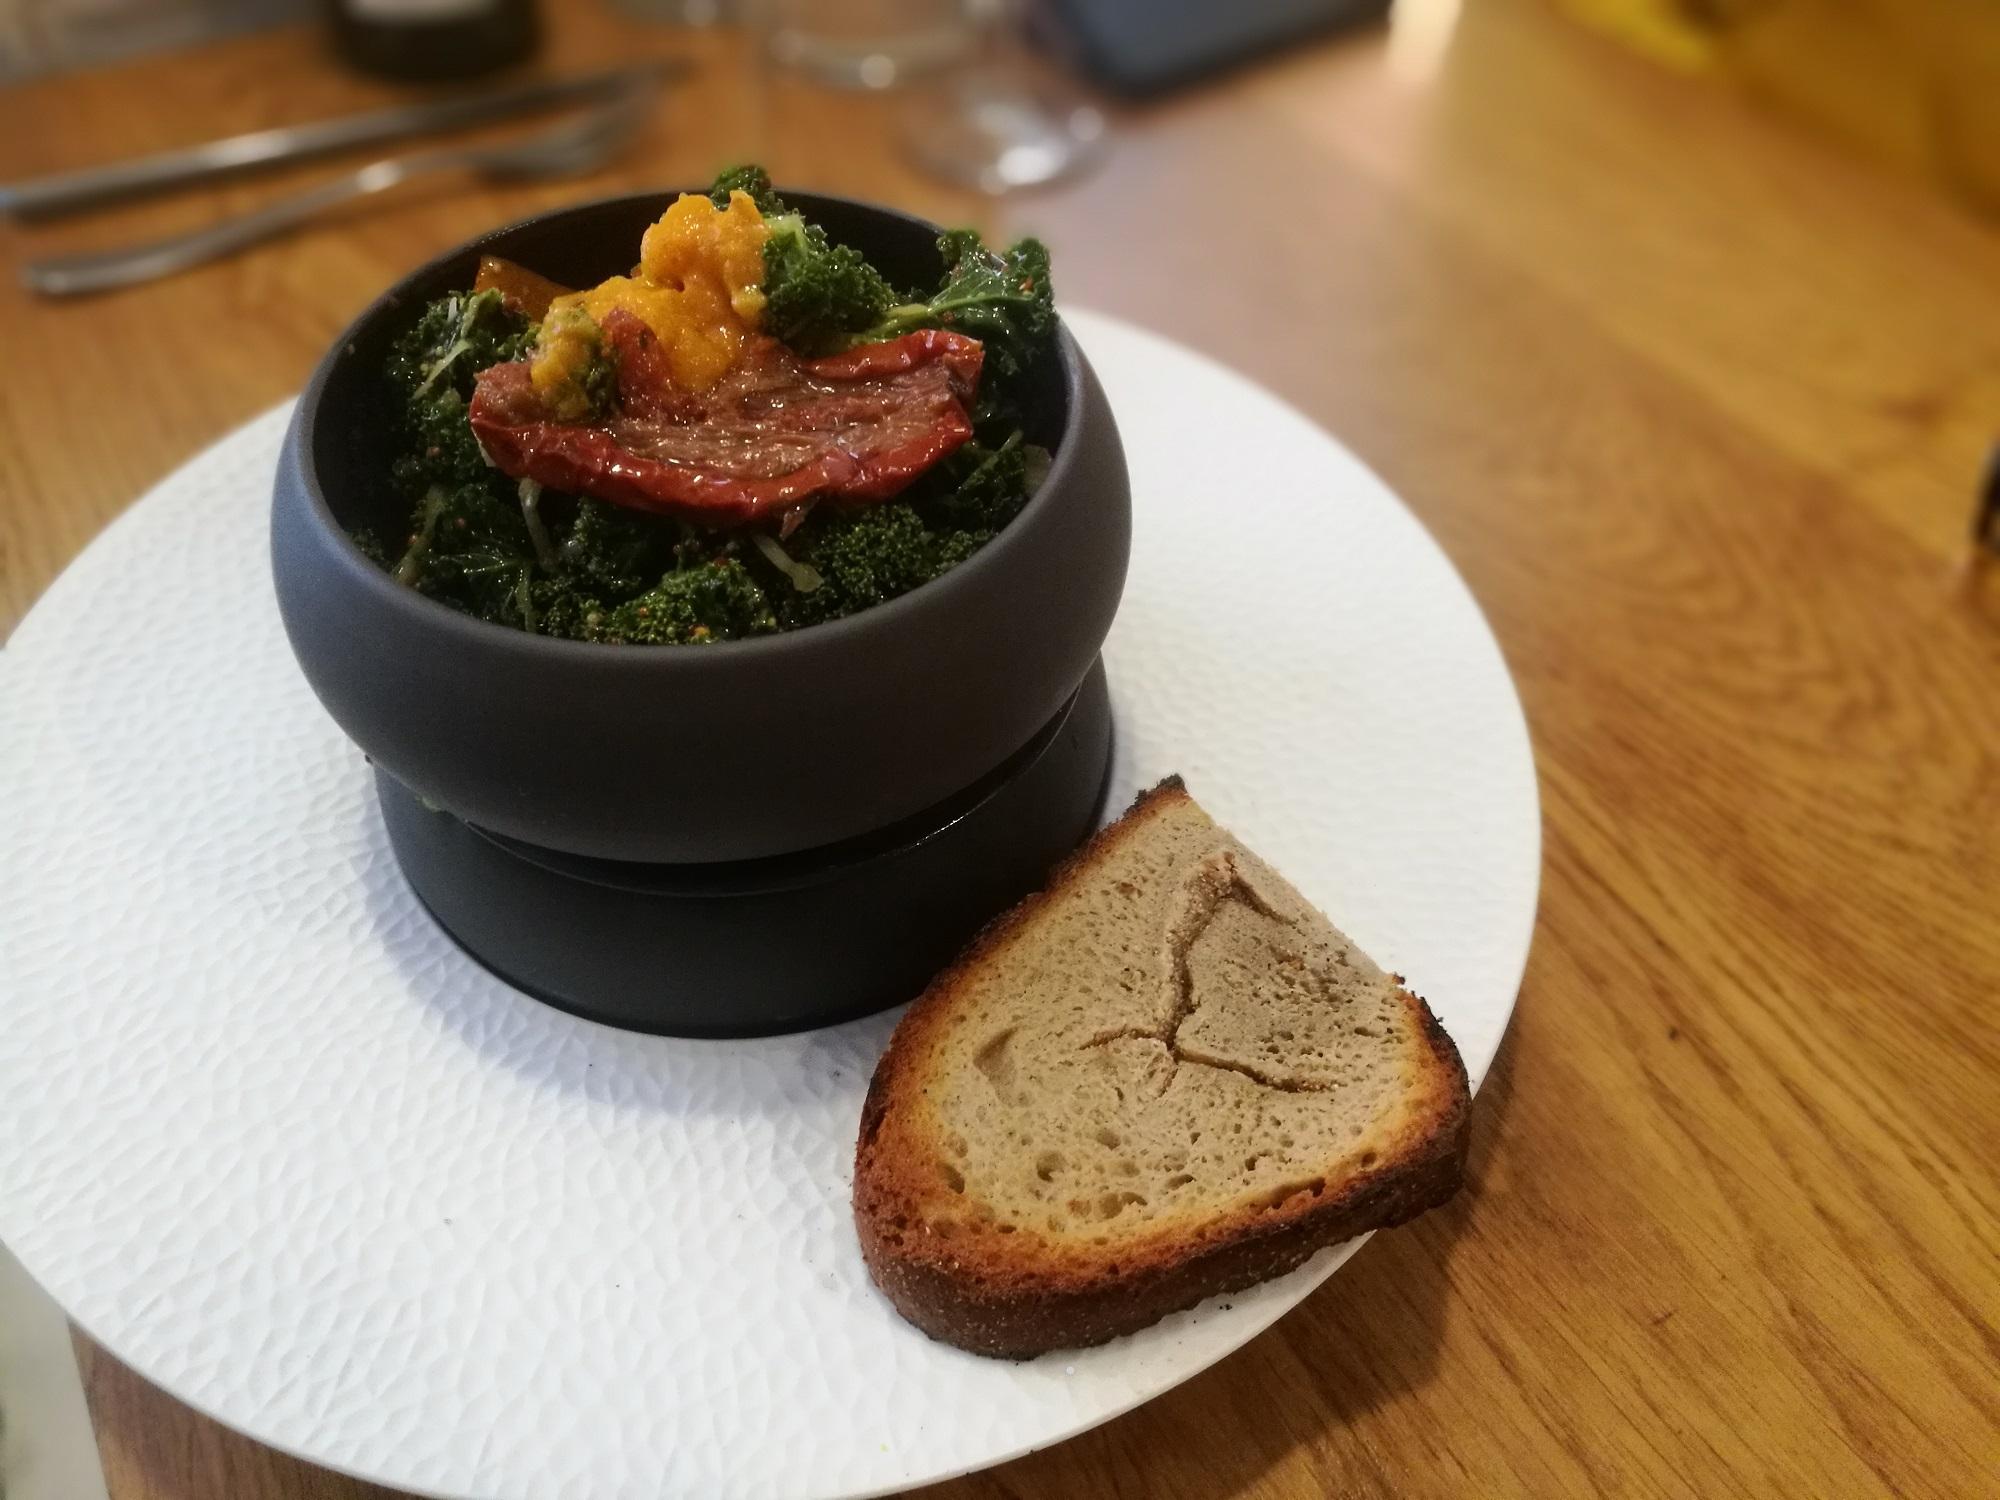 Salade de saison au chou kale